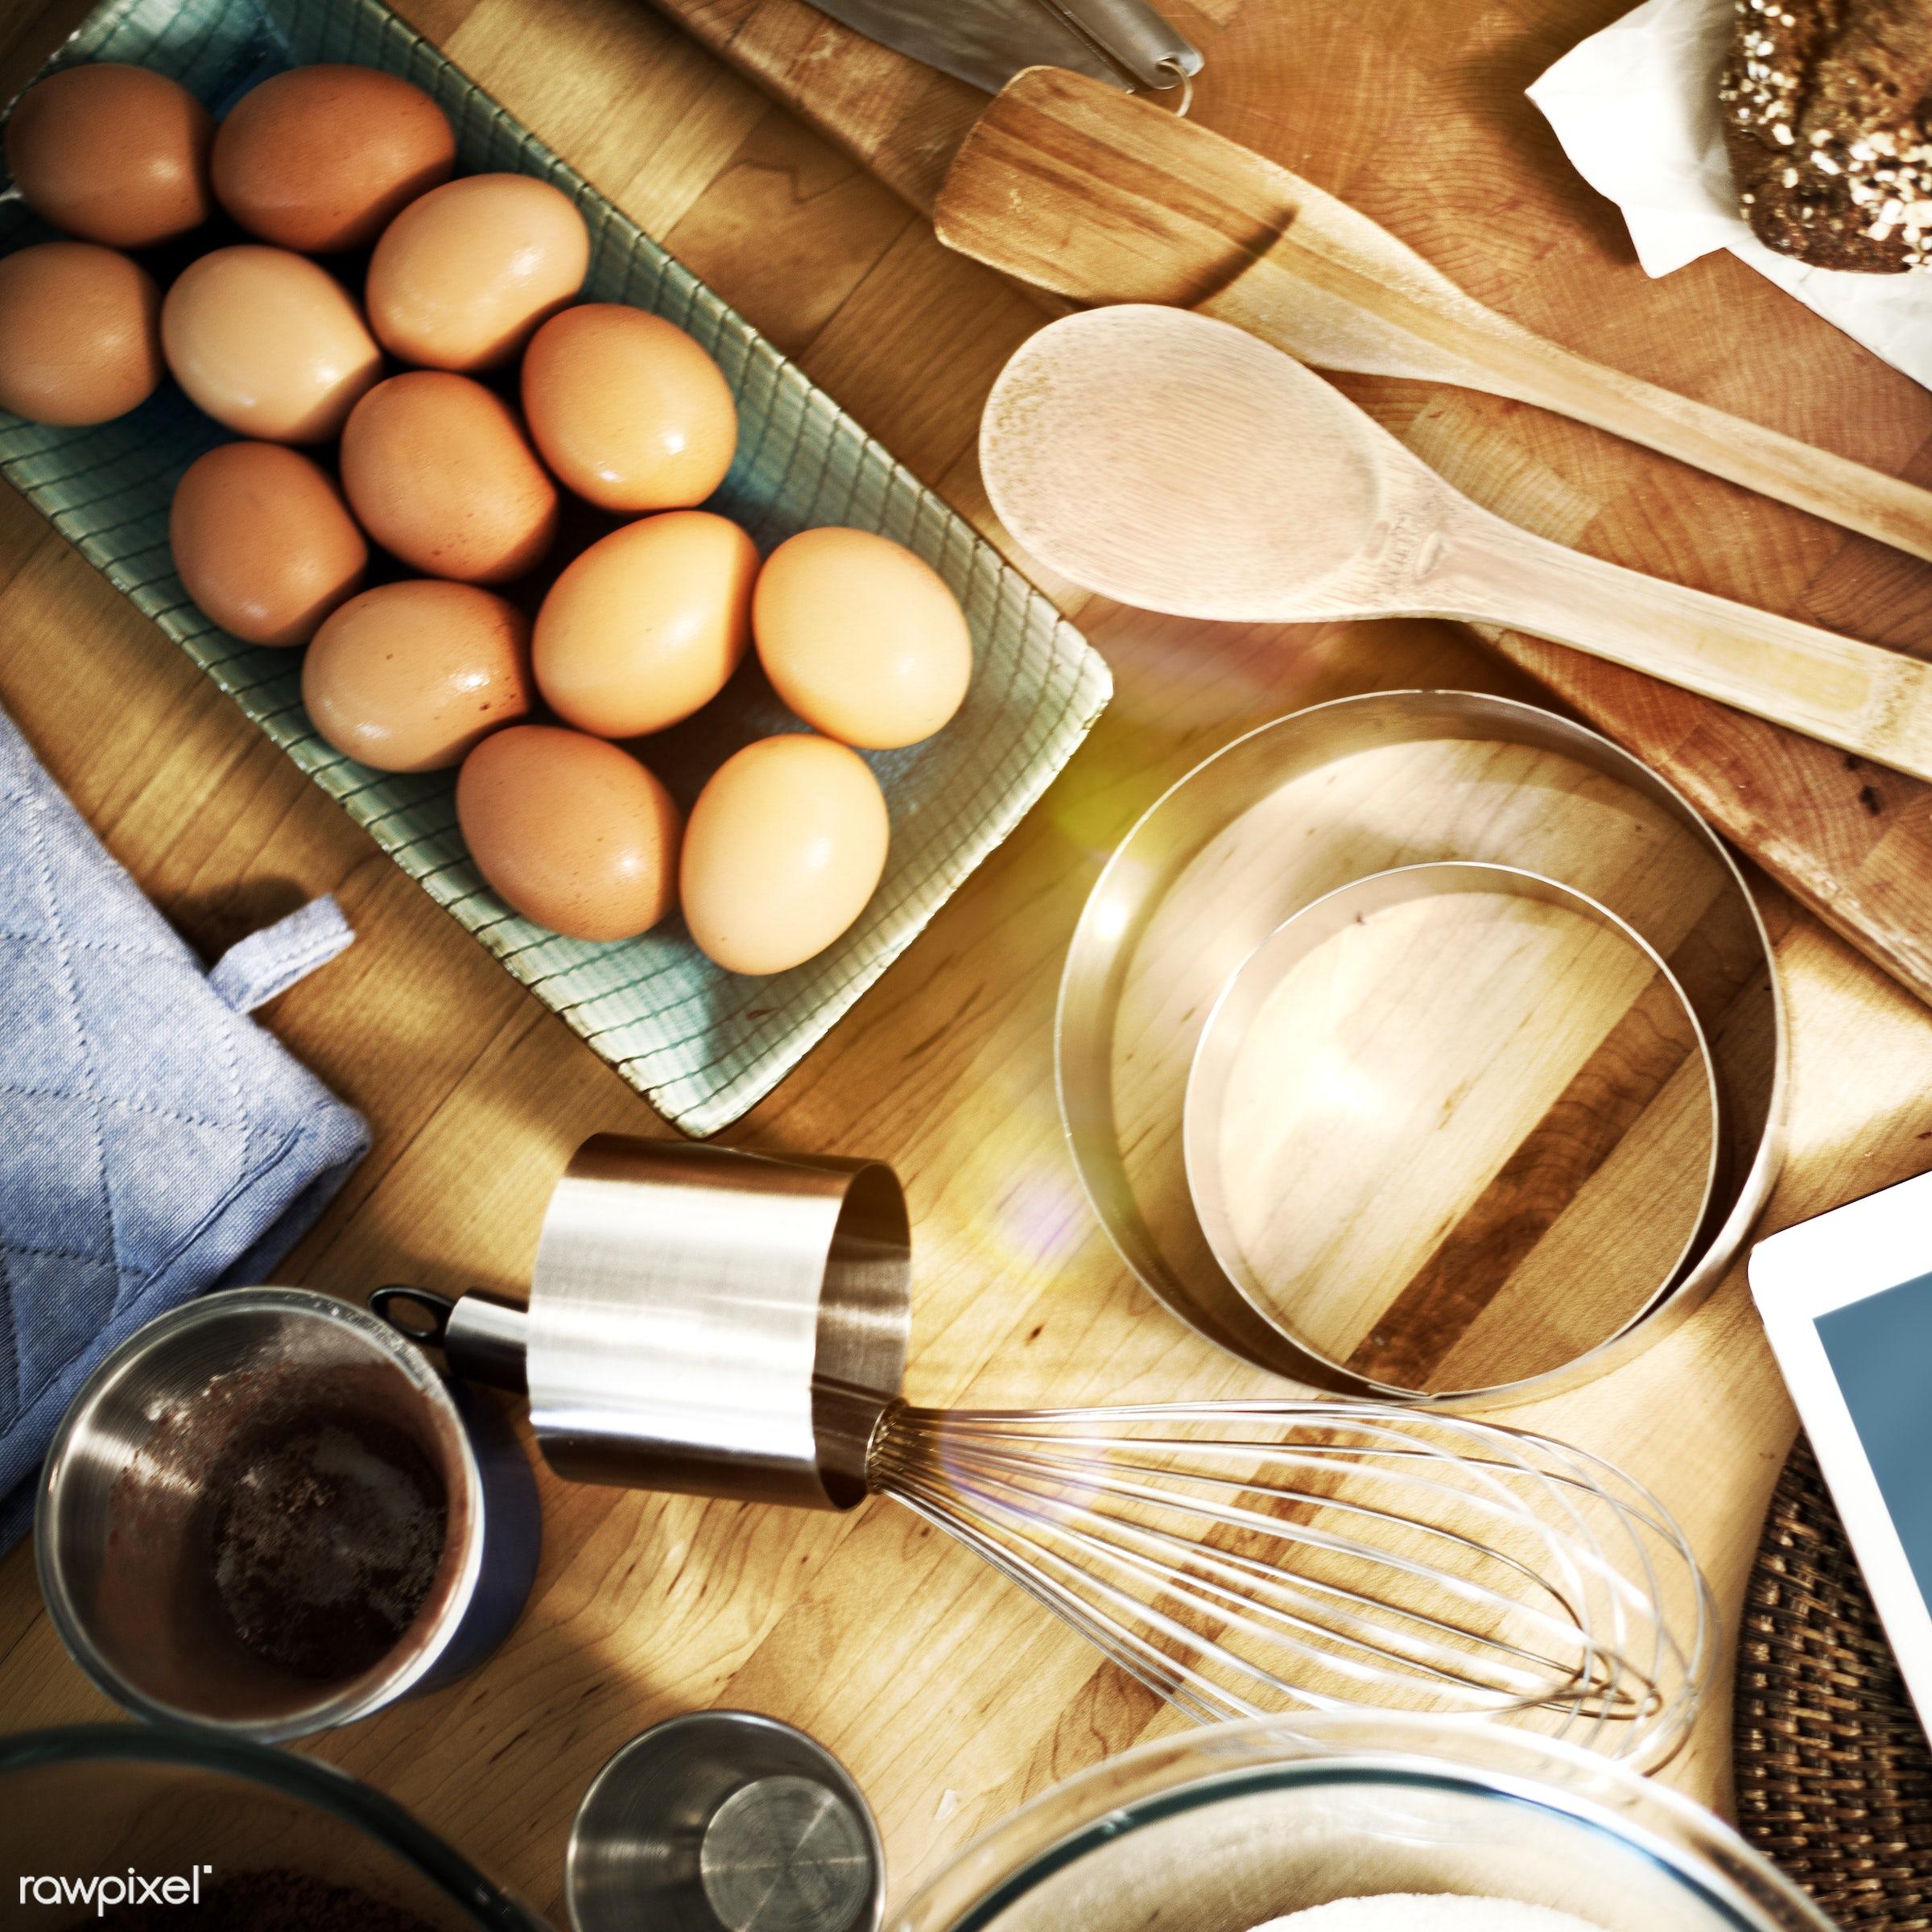 baking, bake, bake shop, bakery, chocolate chip cookies, cook, cookies, cooking, cutlery, delicious, diet, eating, eggs,...